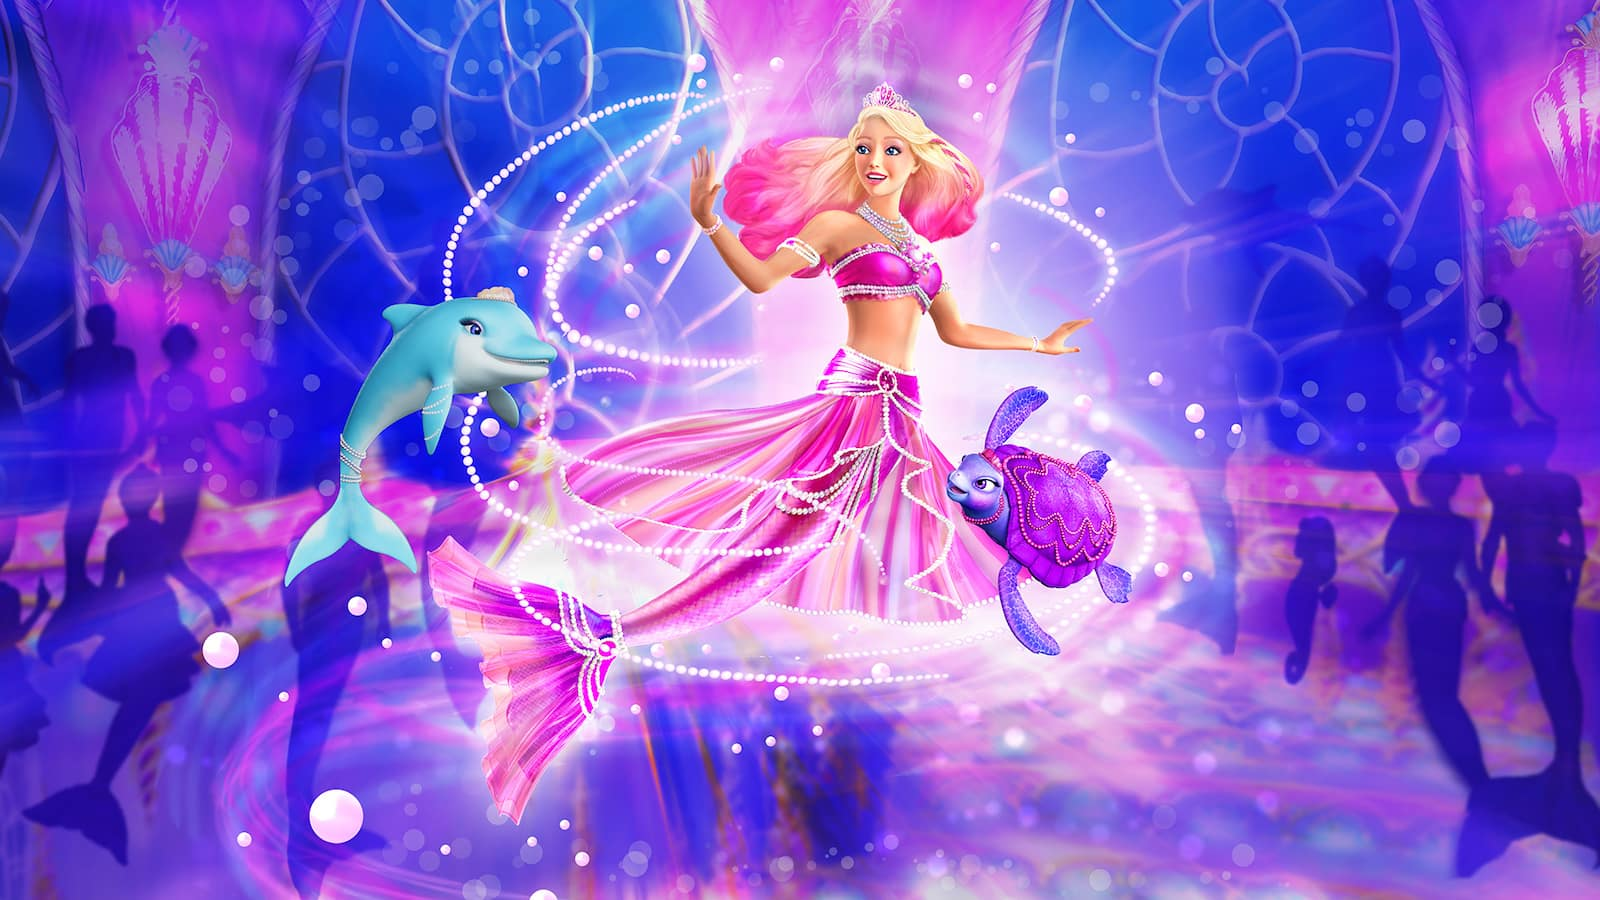 barbie-parlprinsessan-2014